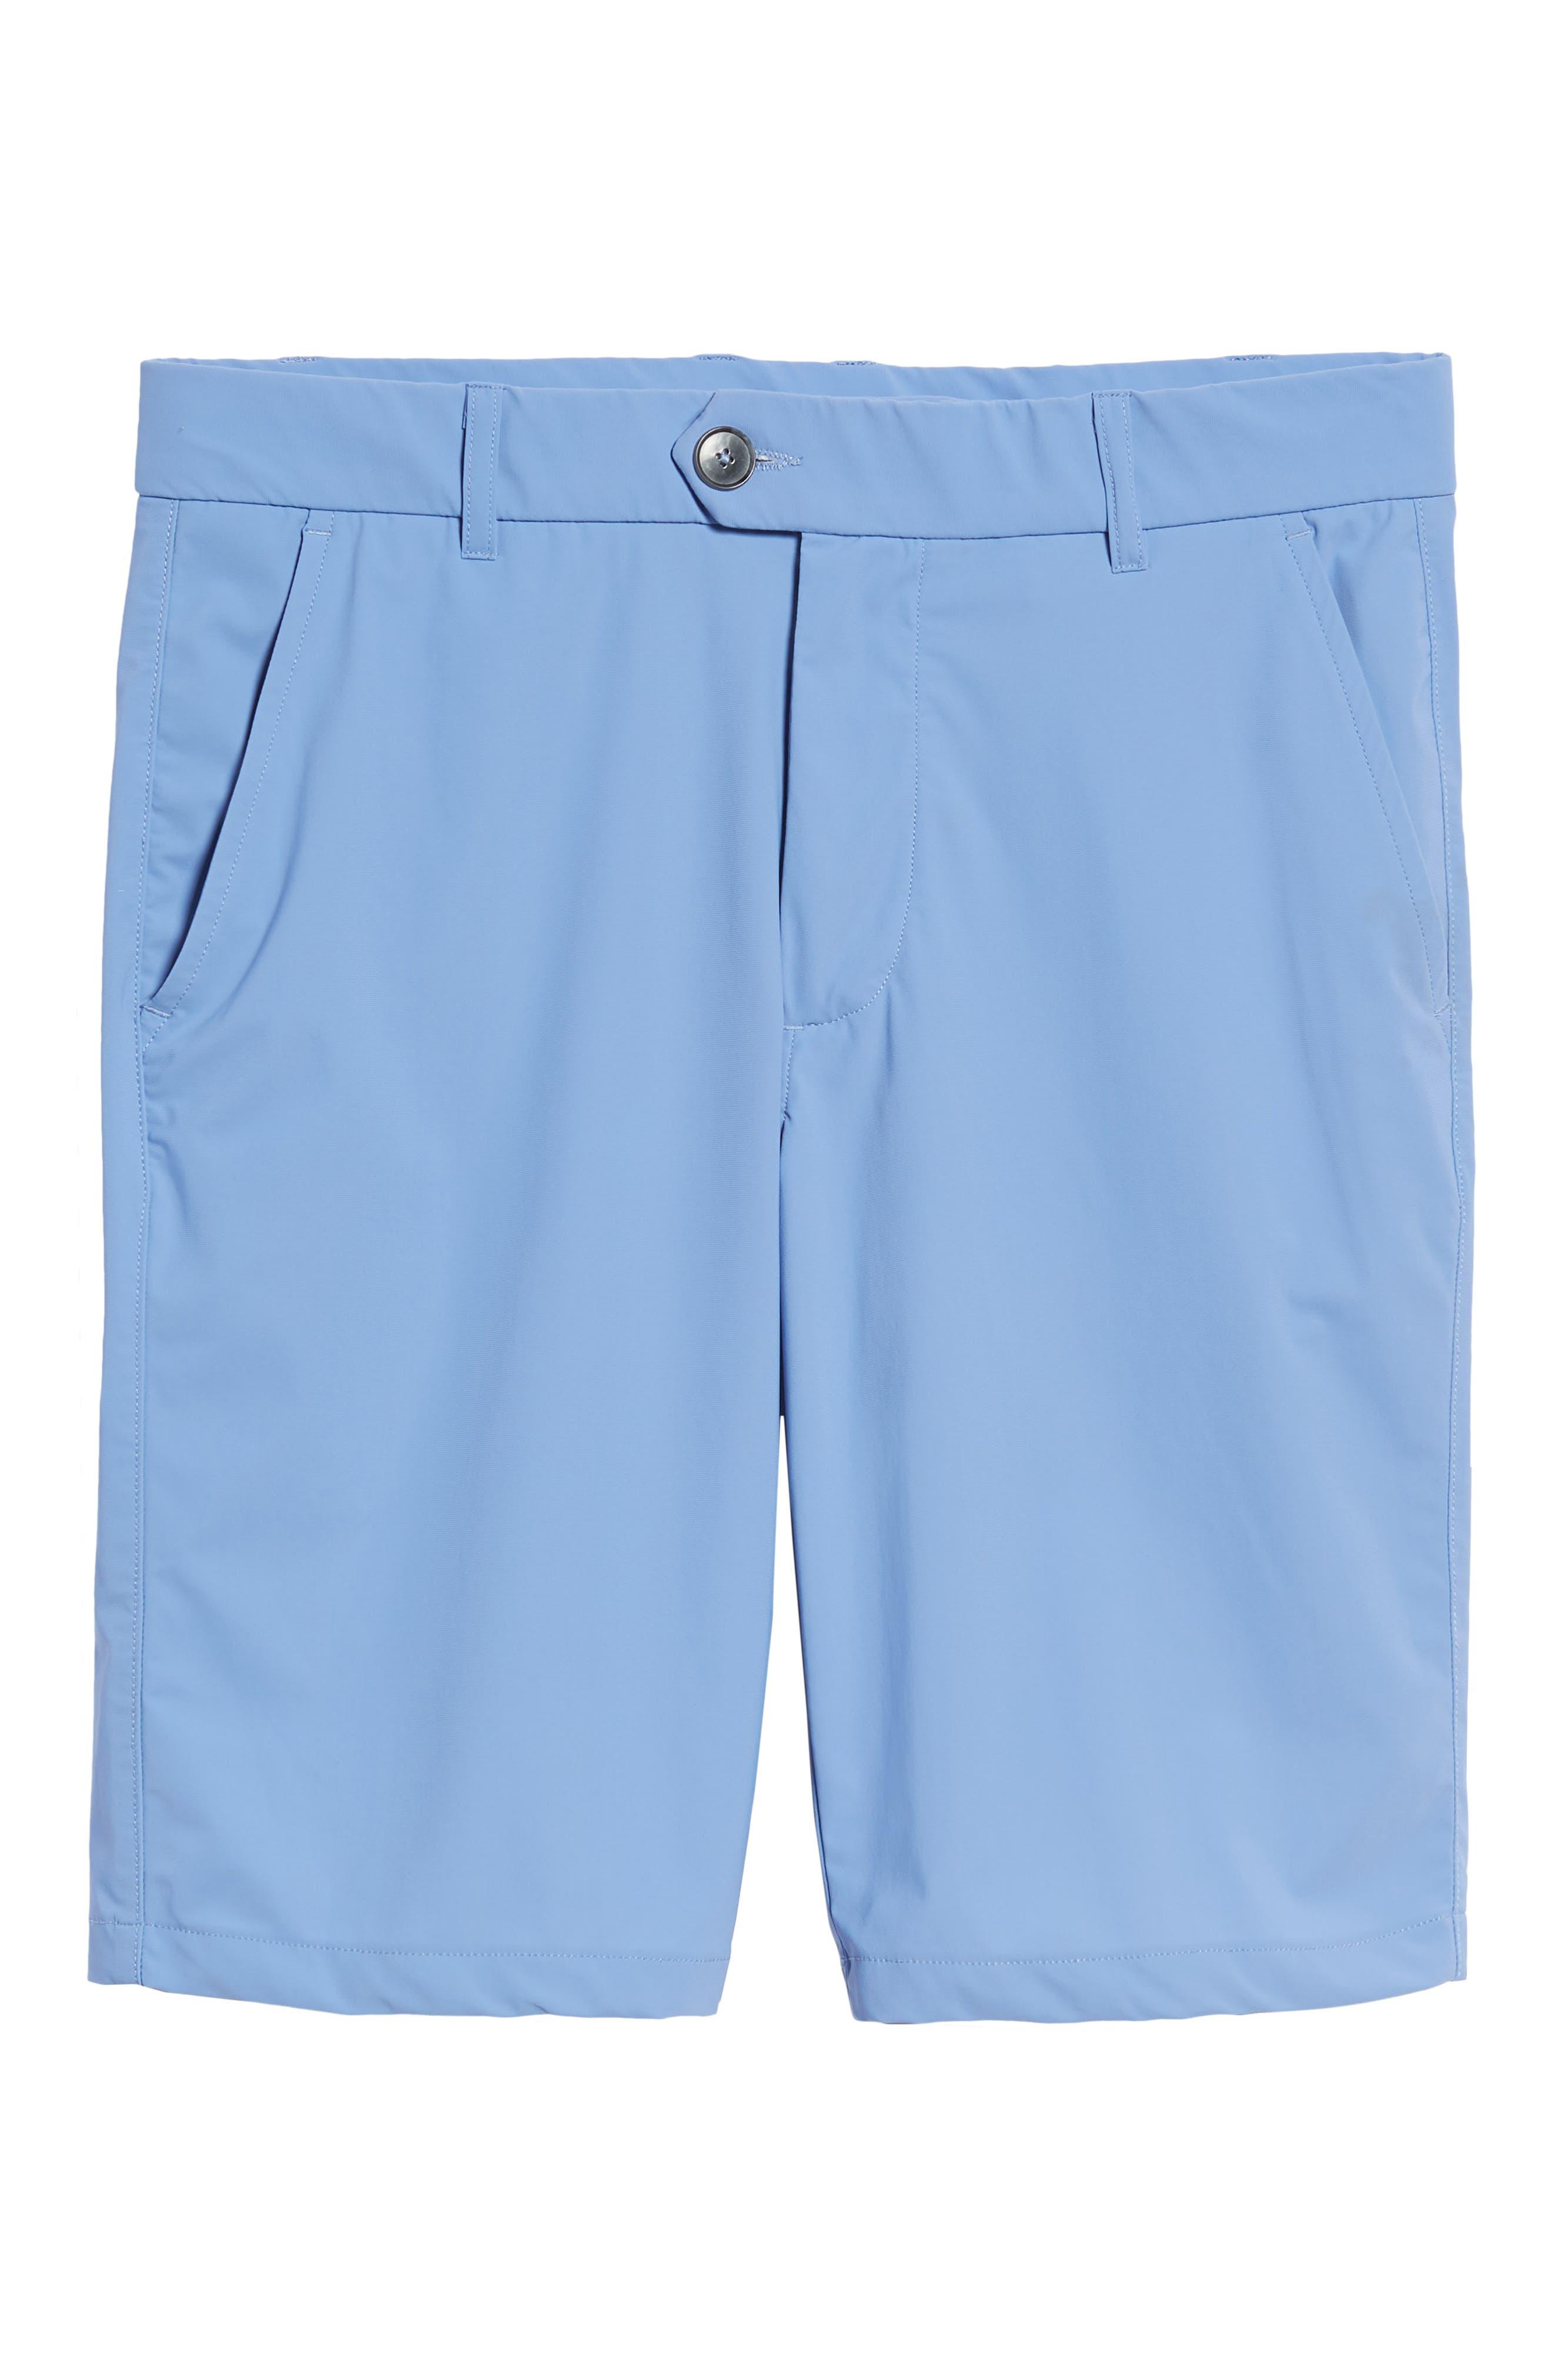 Montauk Shorts,                             Alternate thumbnail 6, color,                             COYOTE